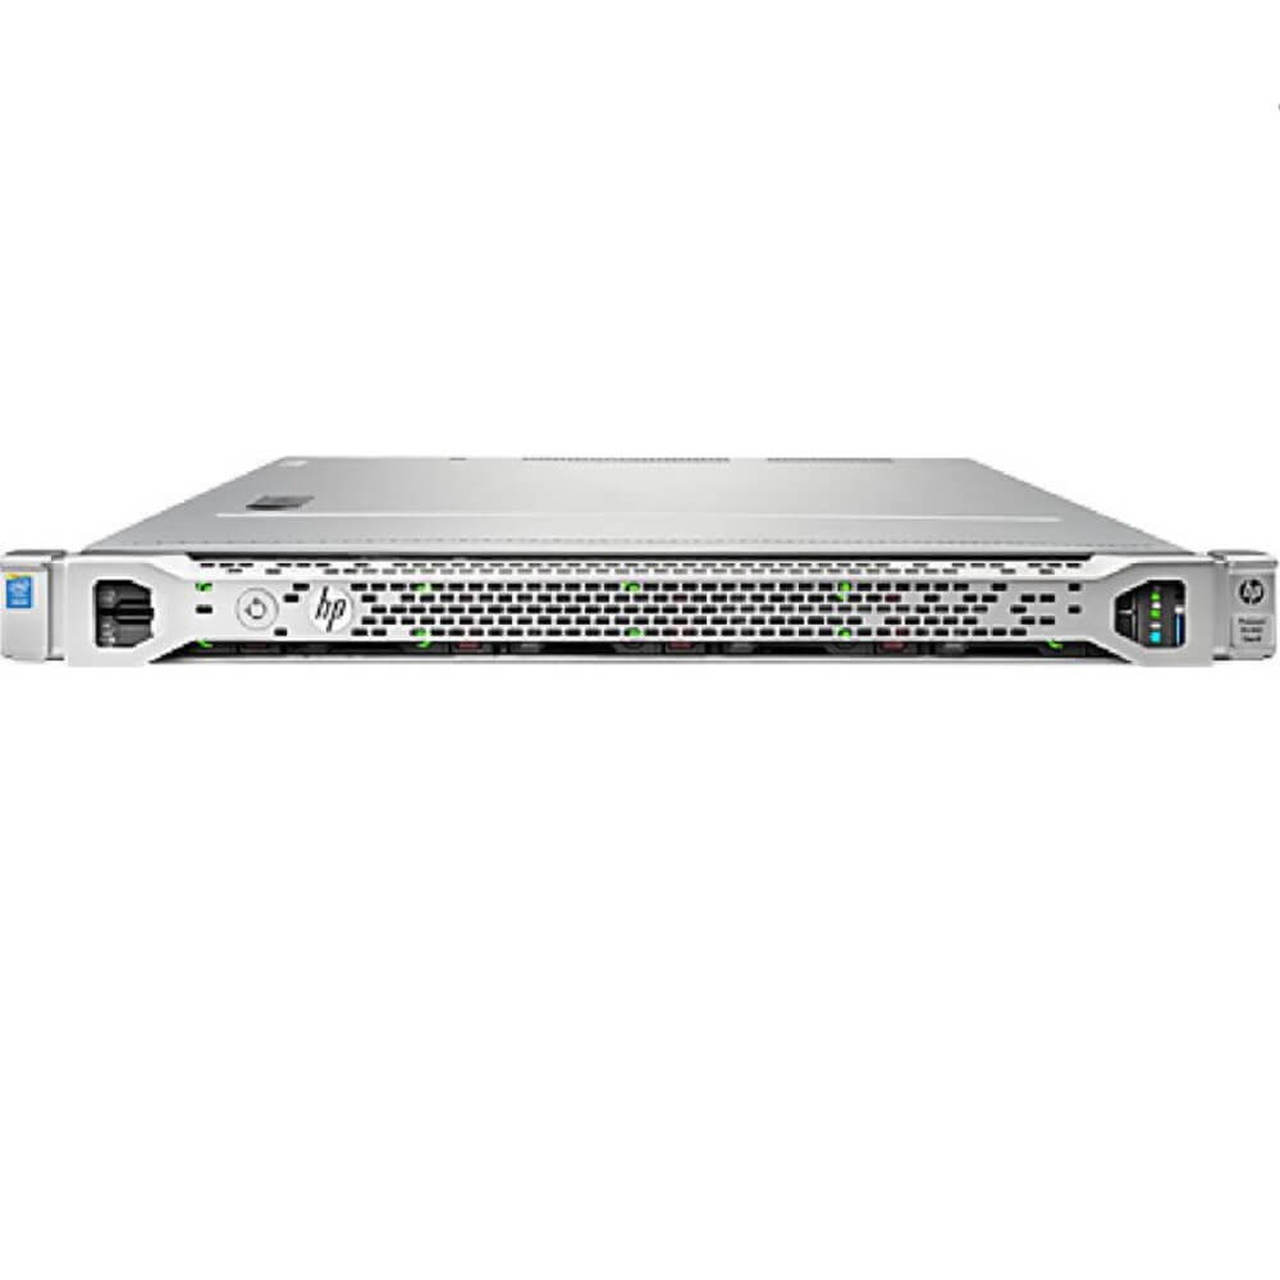 Сервер HPE DL360 Gen9